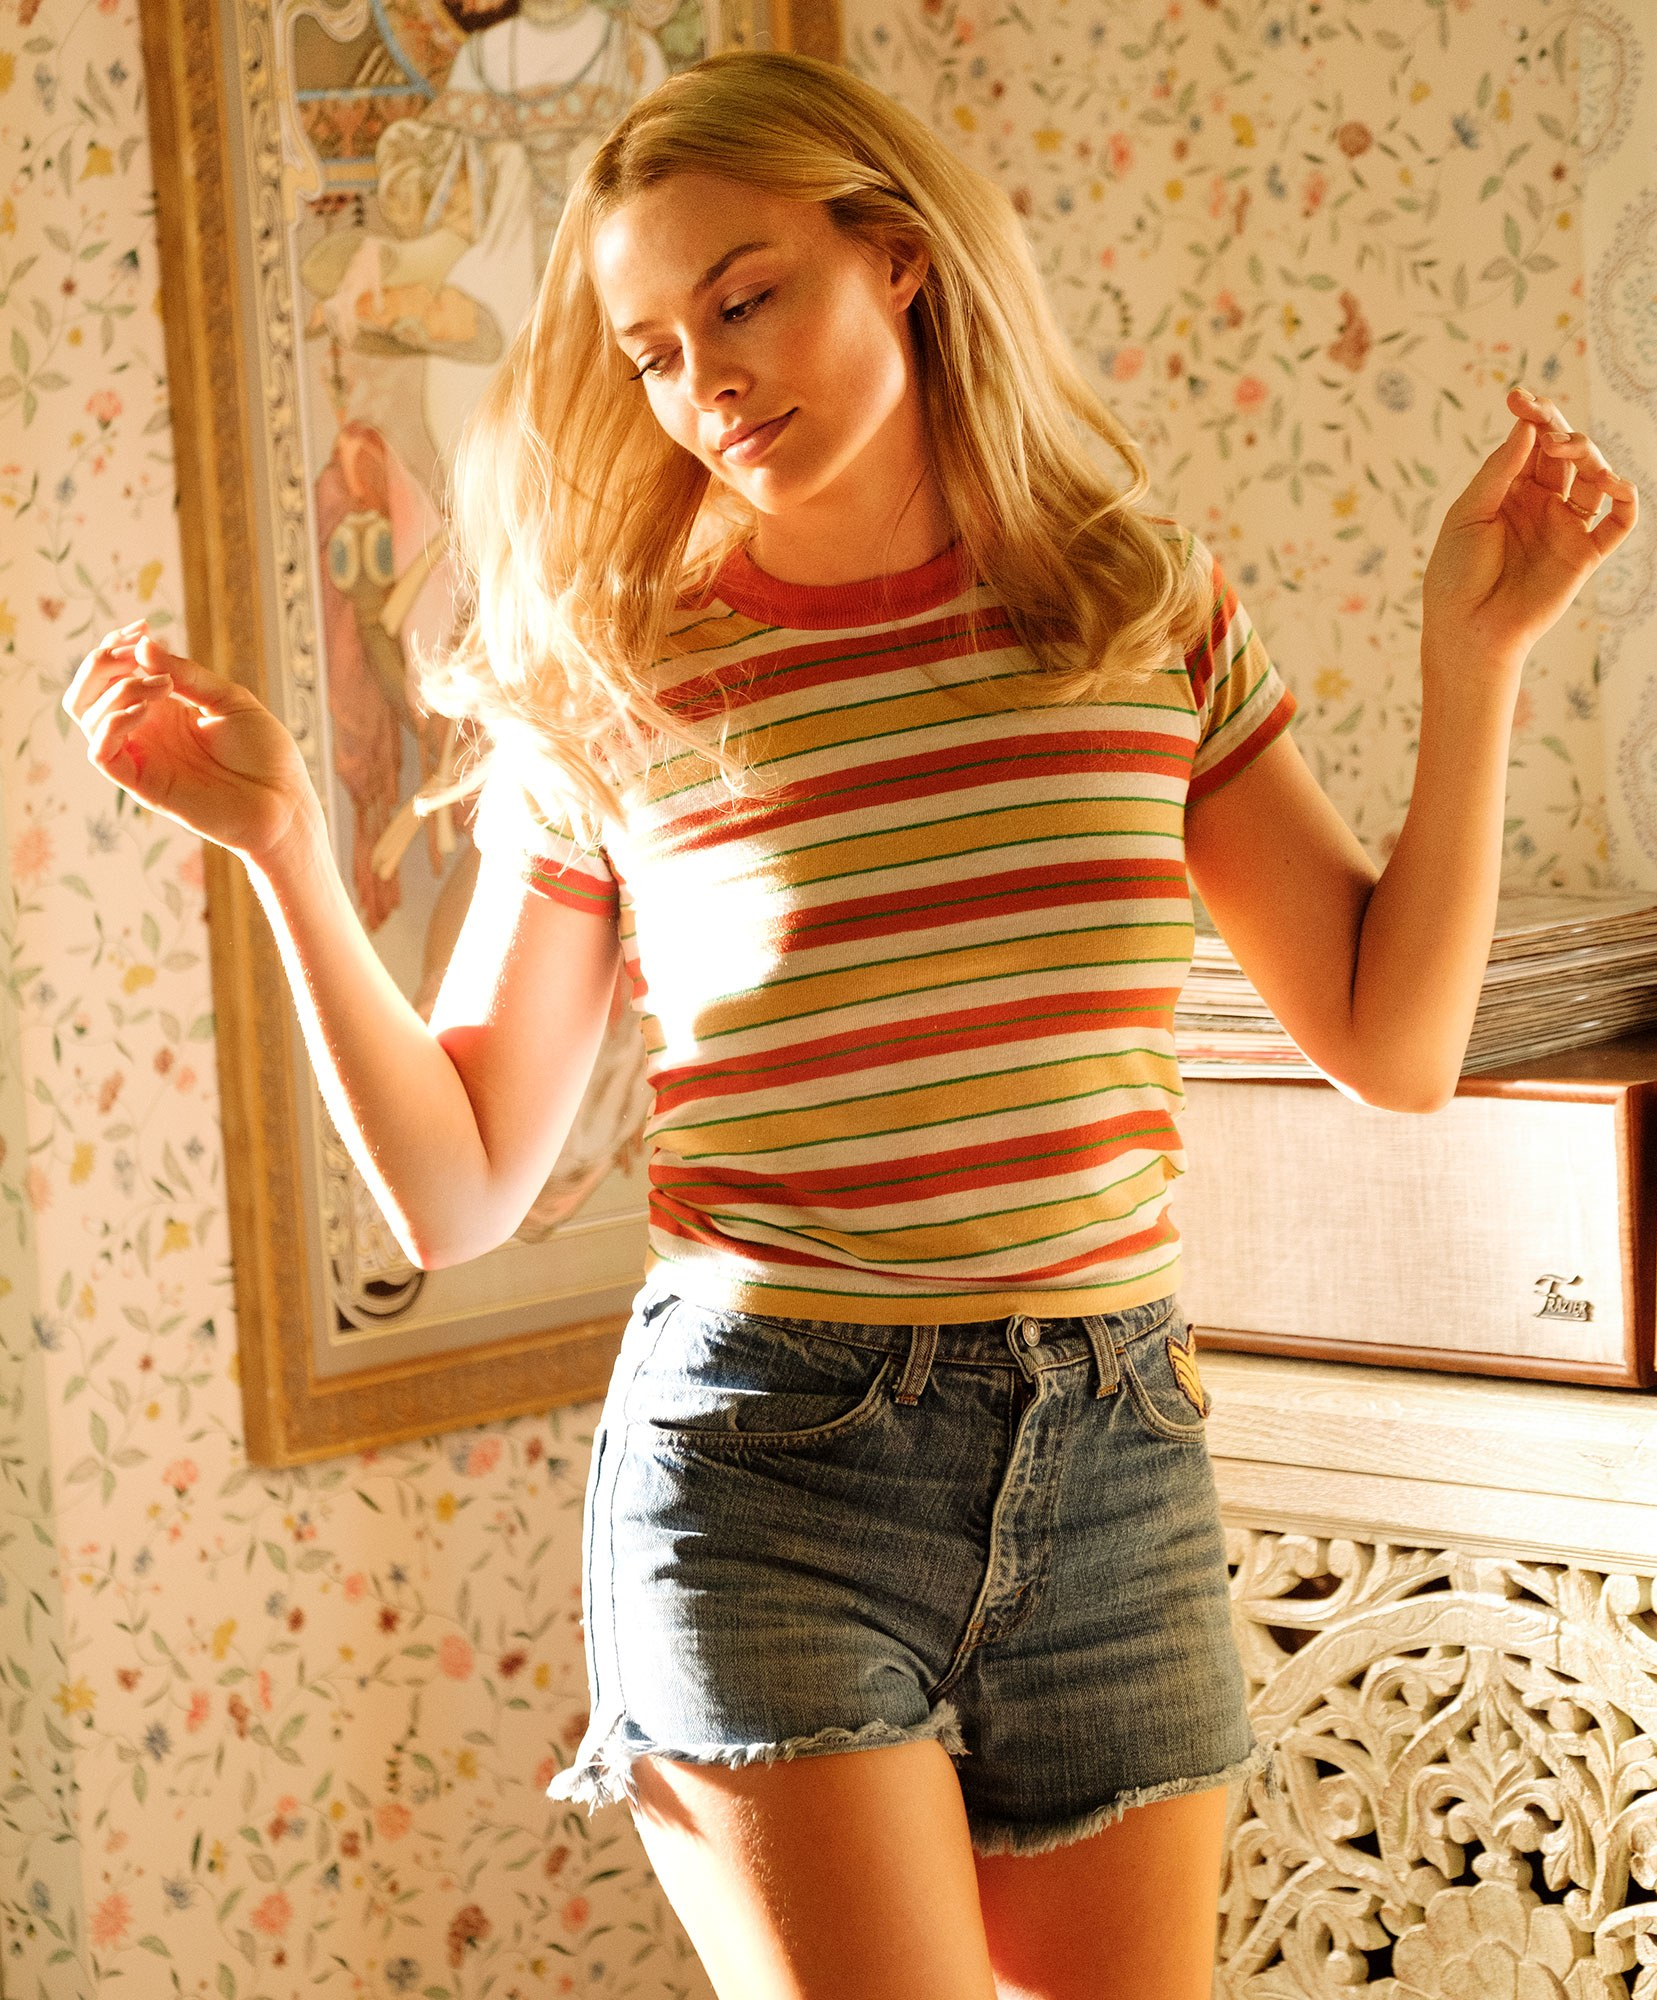 Marvelous Margot Margot Robbiecom